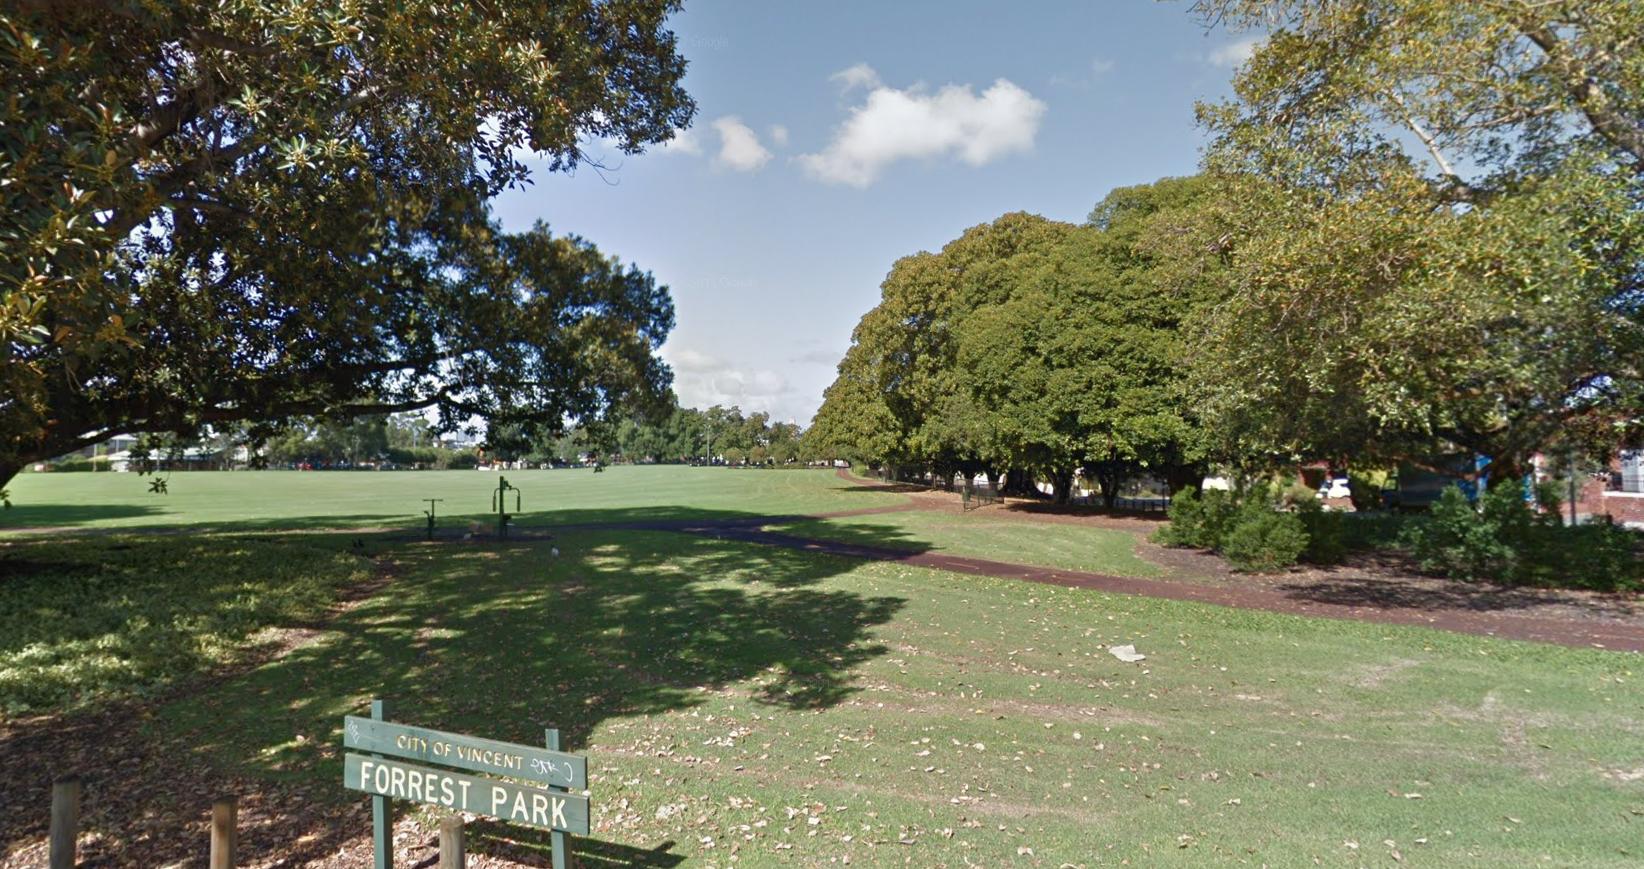 An image of Forrest Park